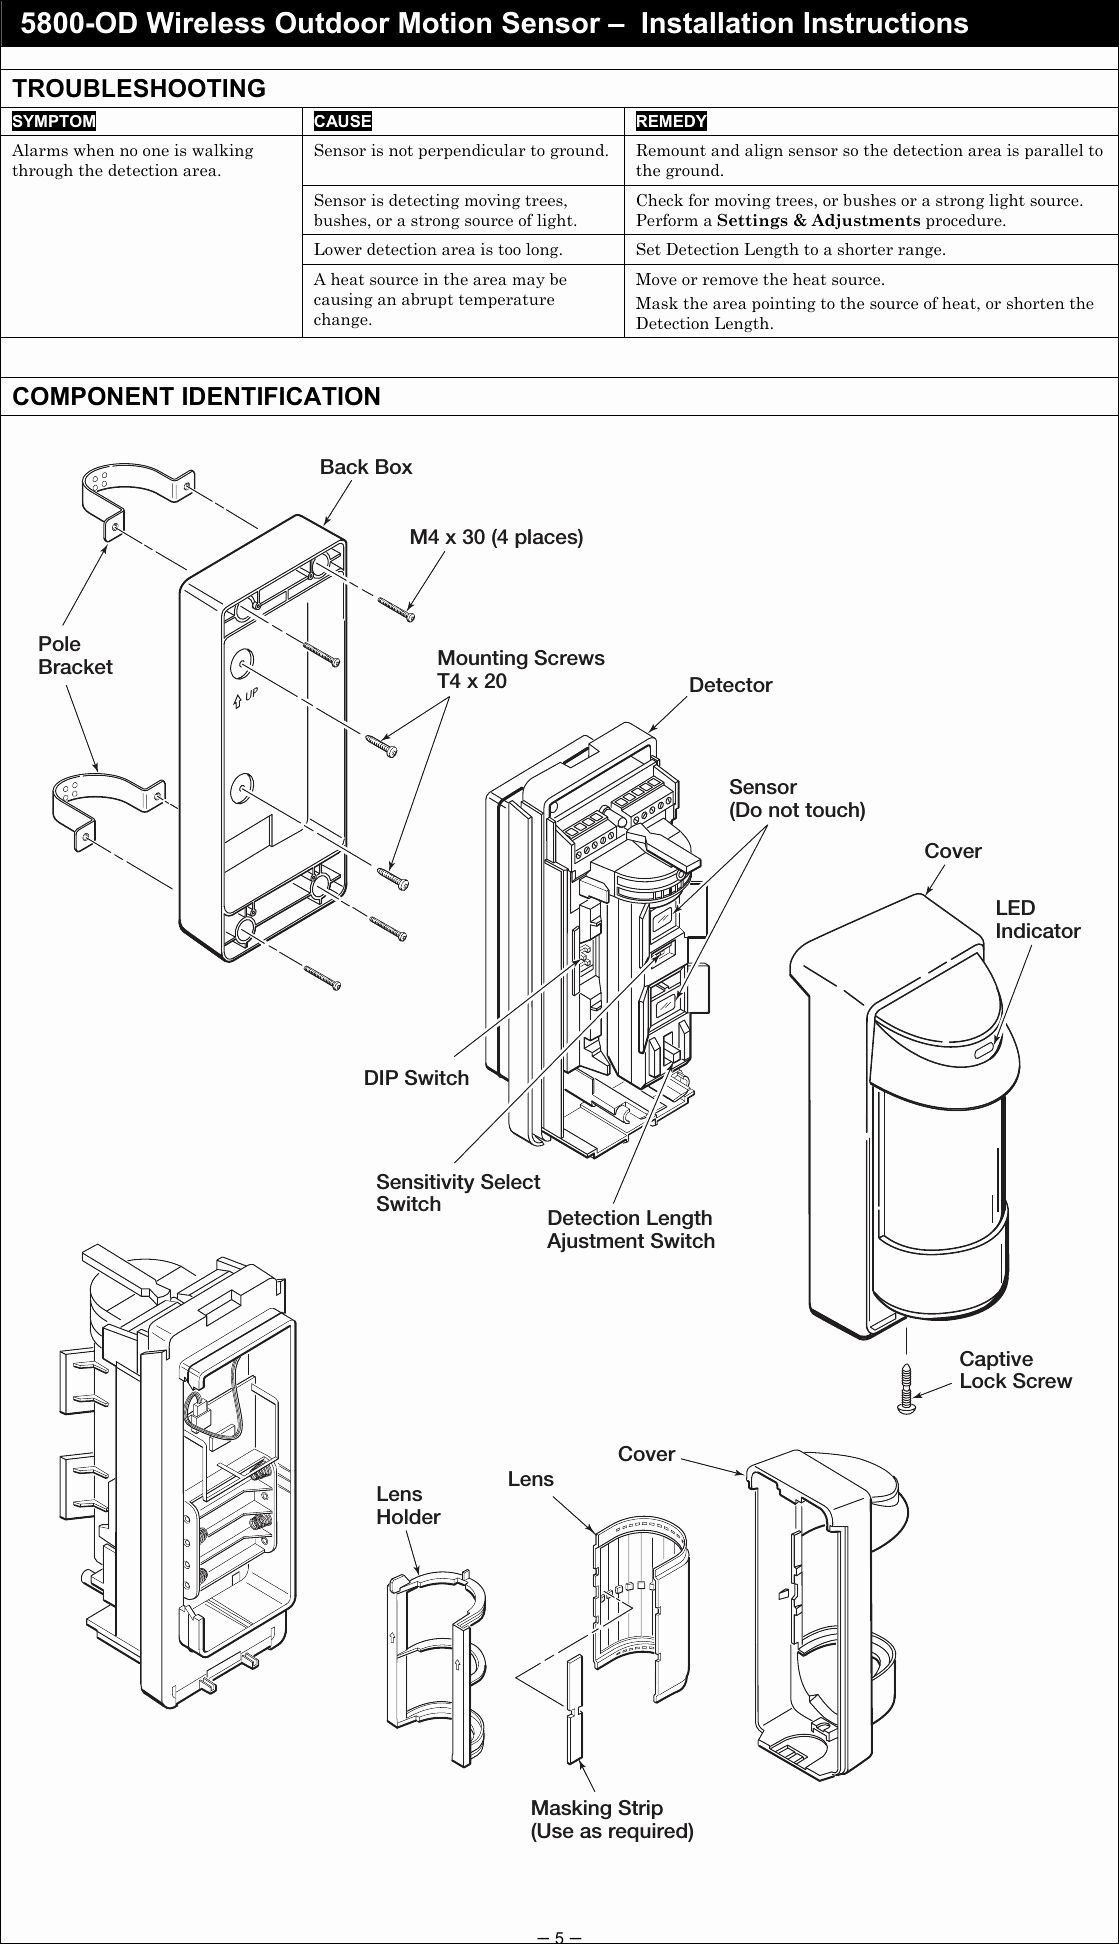 Motion Sensor Light Wiring Diagram : motion, sensor, light, wiring, diagram, Unique, Wiring, Diagram, Outdoor, Motion, Detector, Light, #diagrams, #digramssample, #diagramimages, Sensor, Lights, Outdoor,, Lights,, Flood